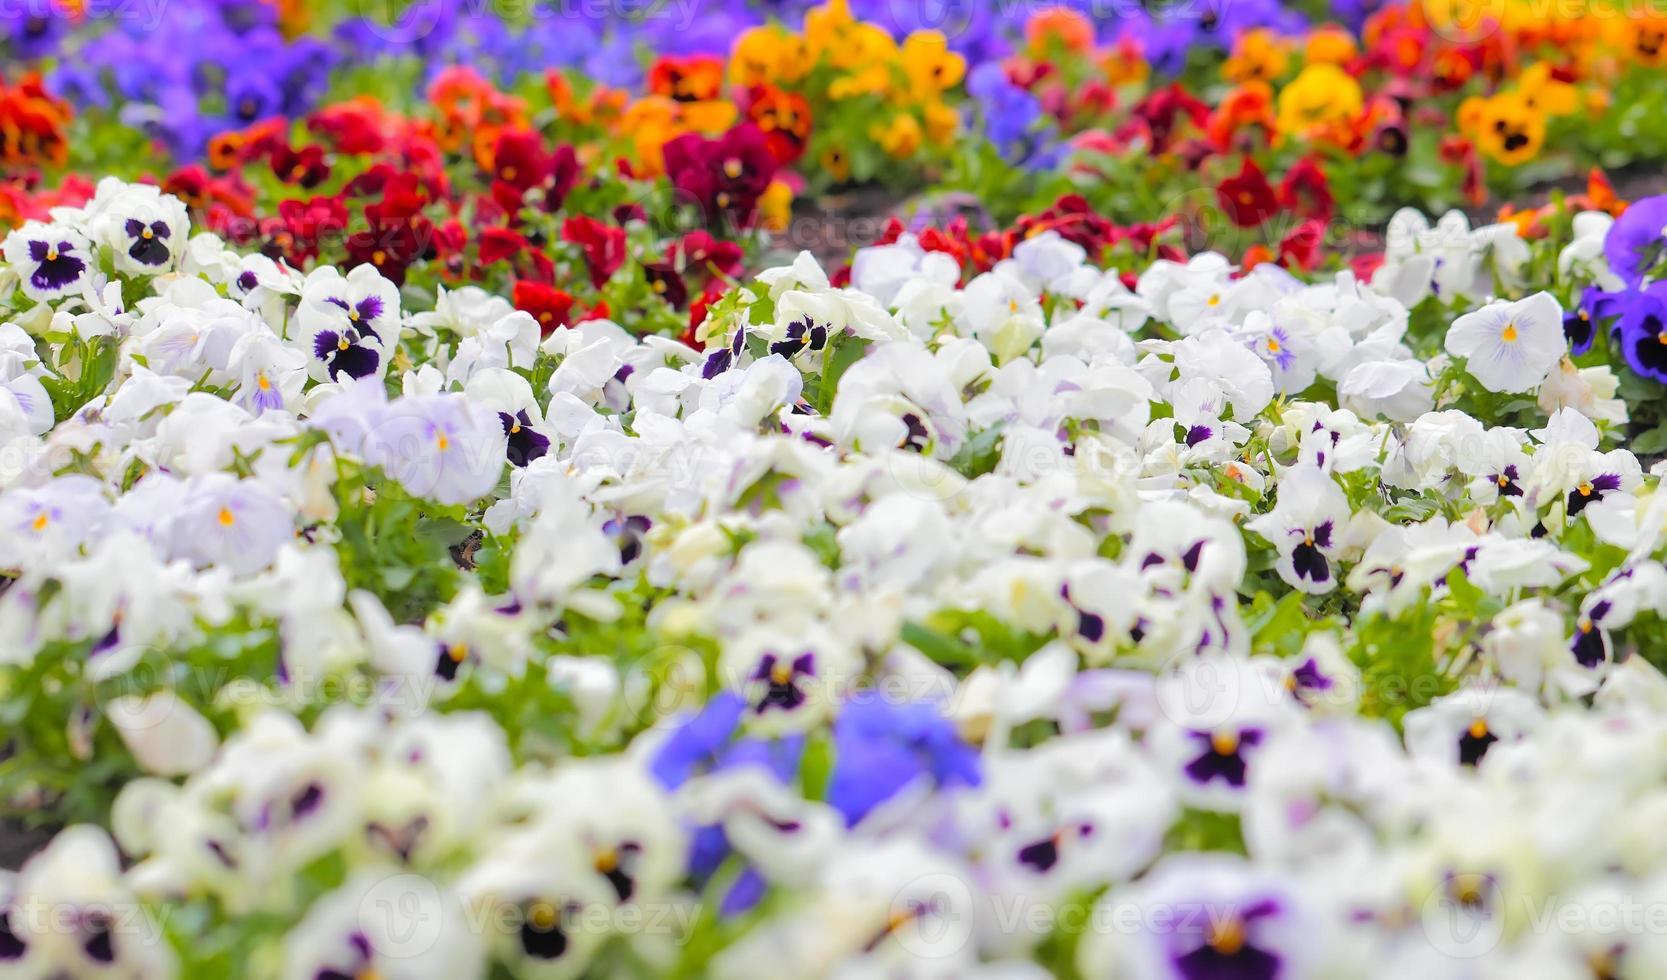 flores coloridas de pansy no canteiro foto